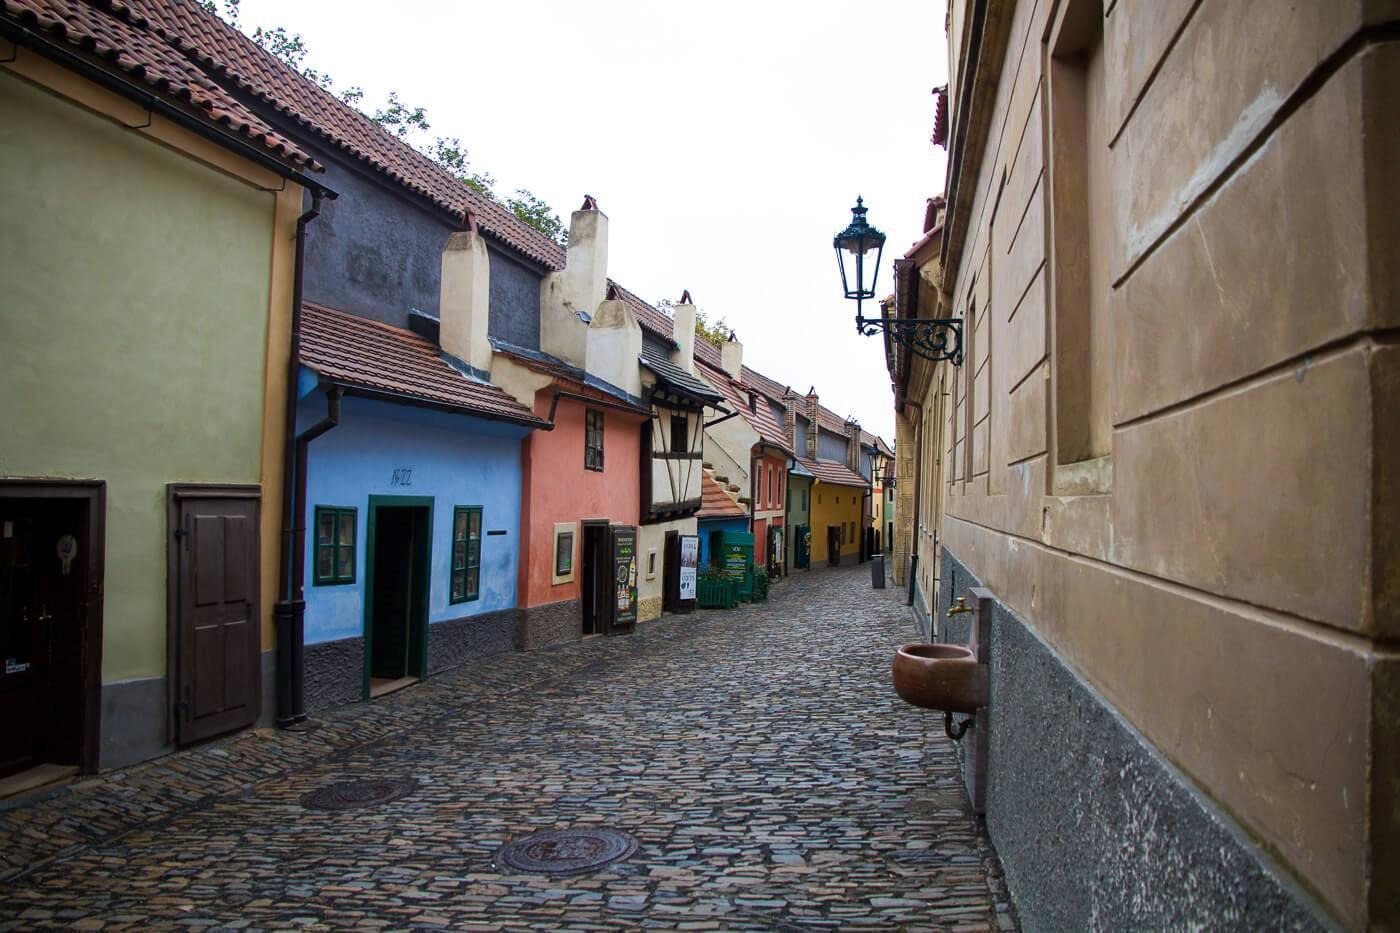 prague-castle-and-mala-strana-district-tour-21